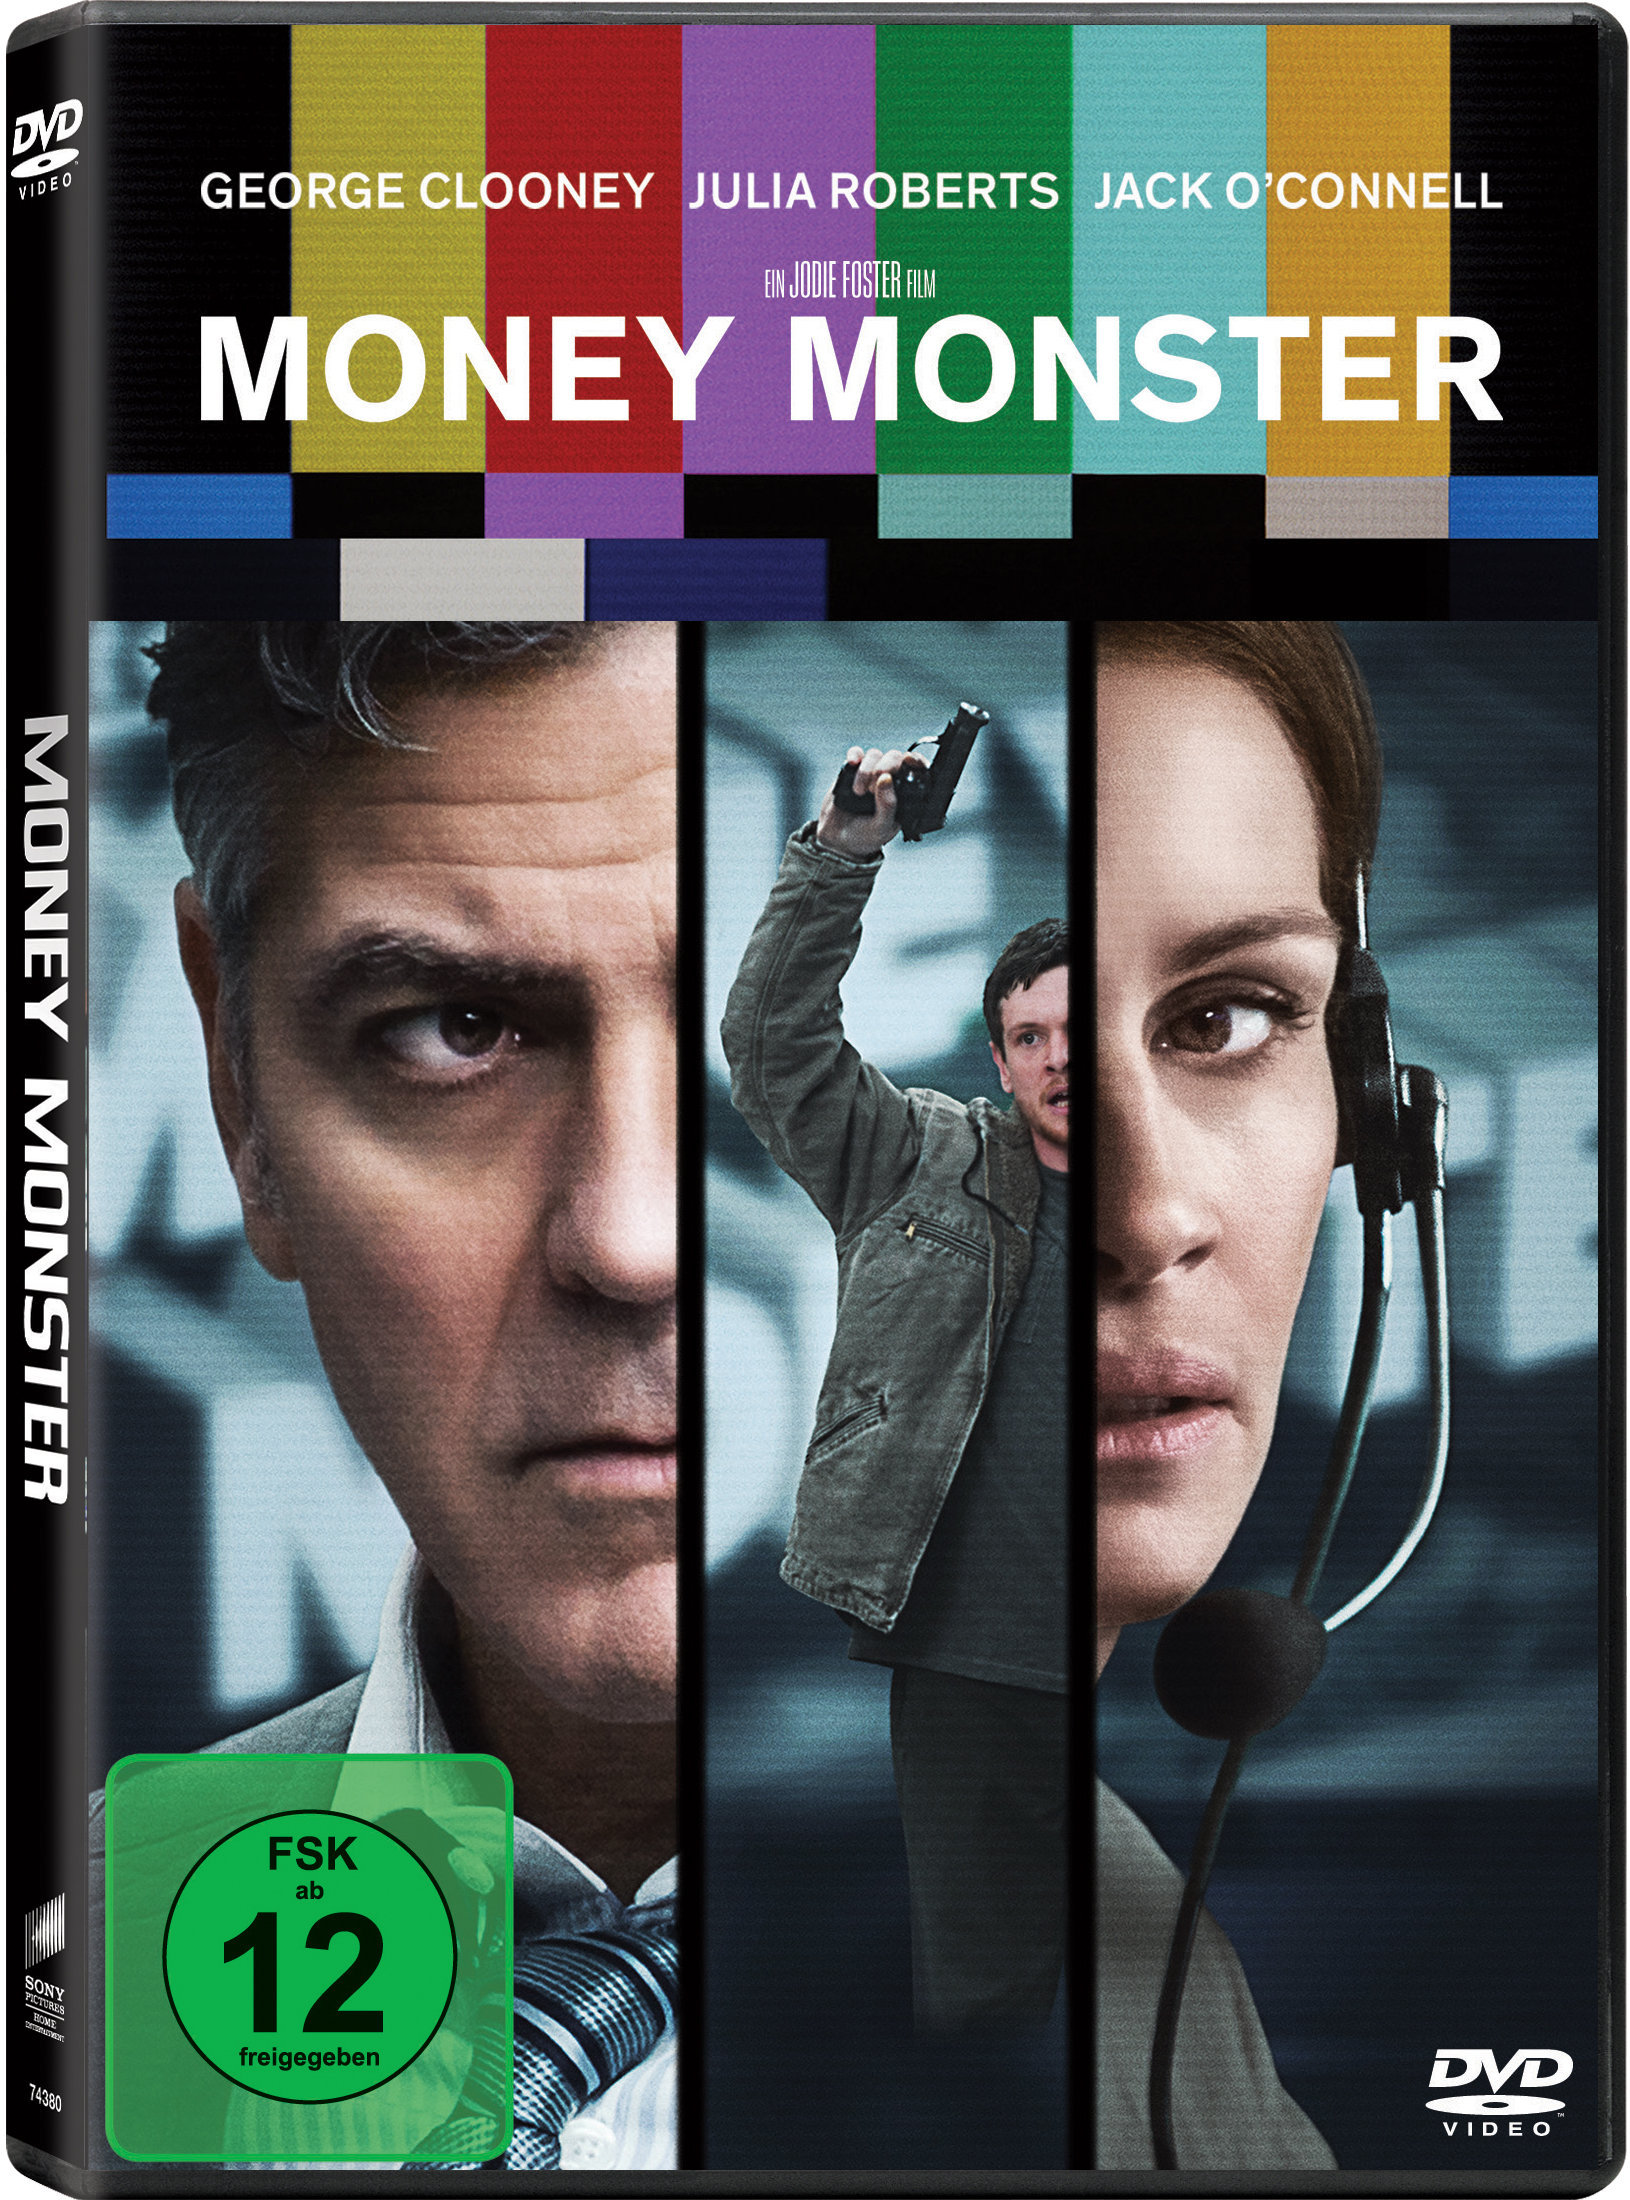 Image of Money Monster